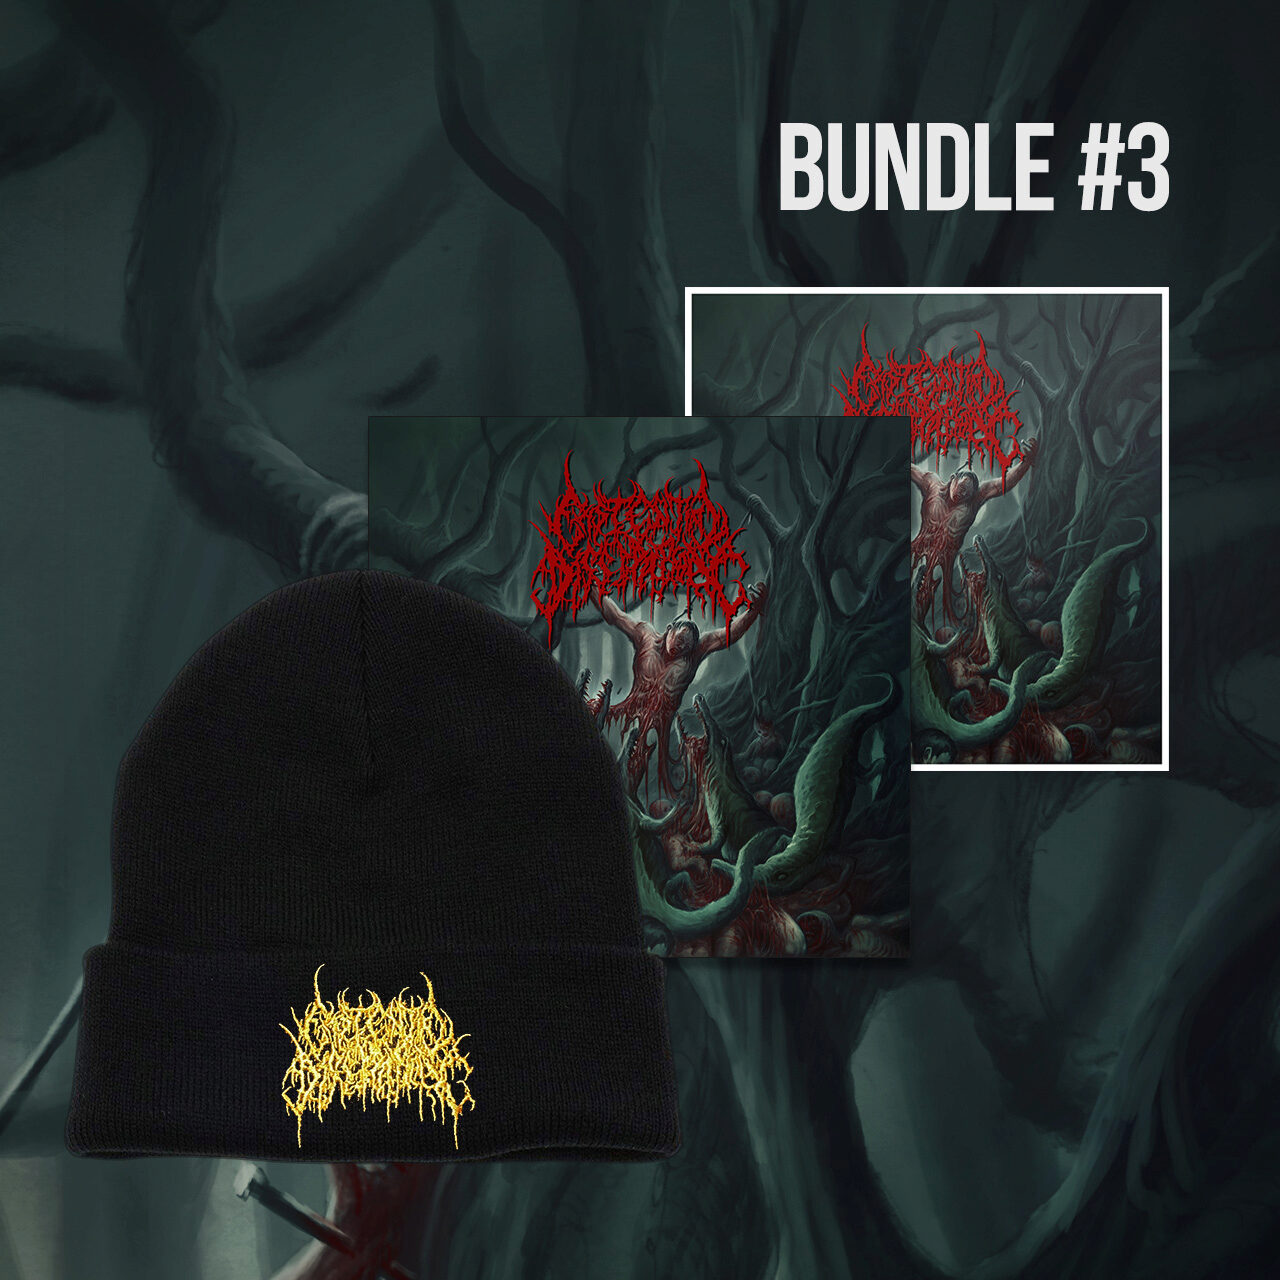 Bundle 3 contains the CD, a sticker, and a black toque